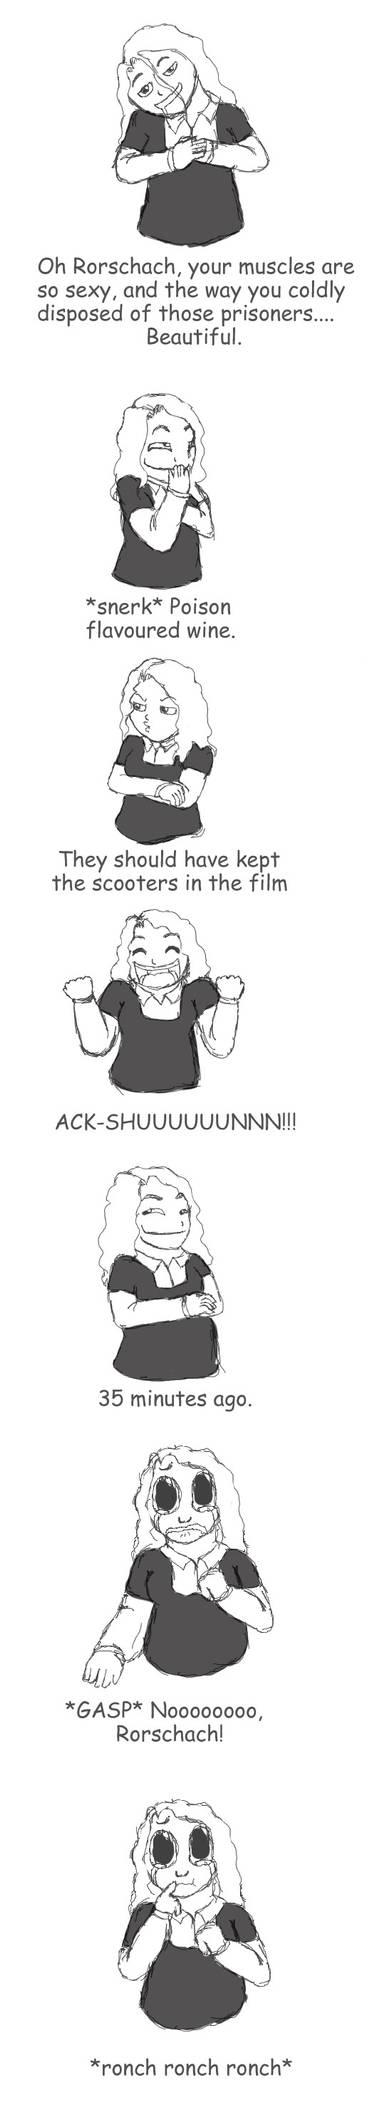 Watchmen reaction 2